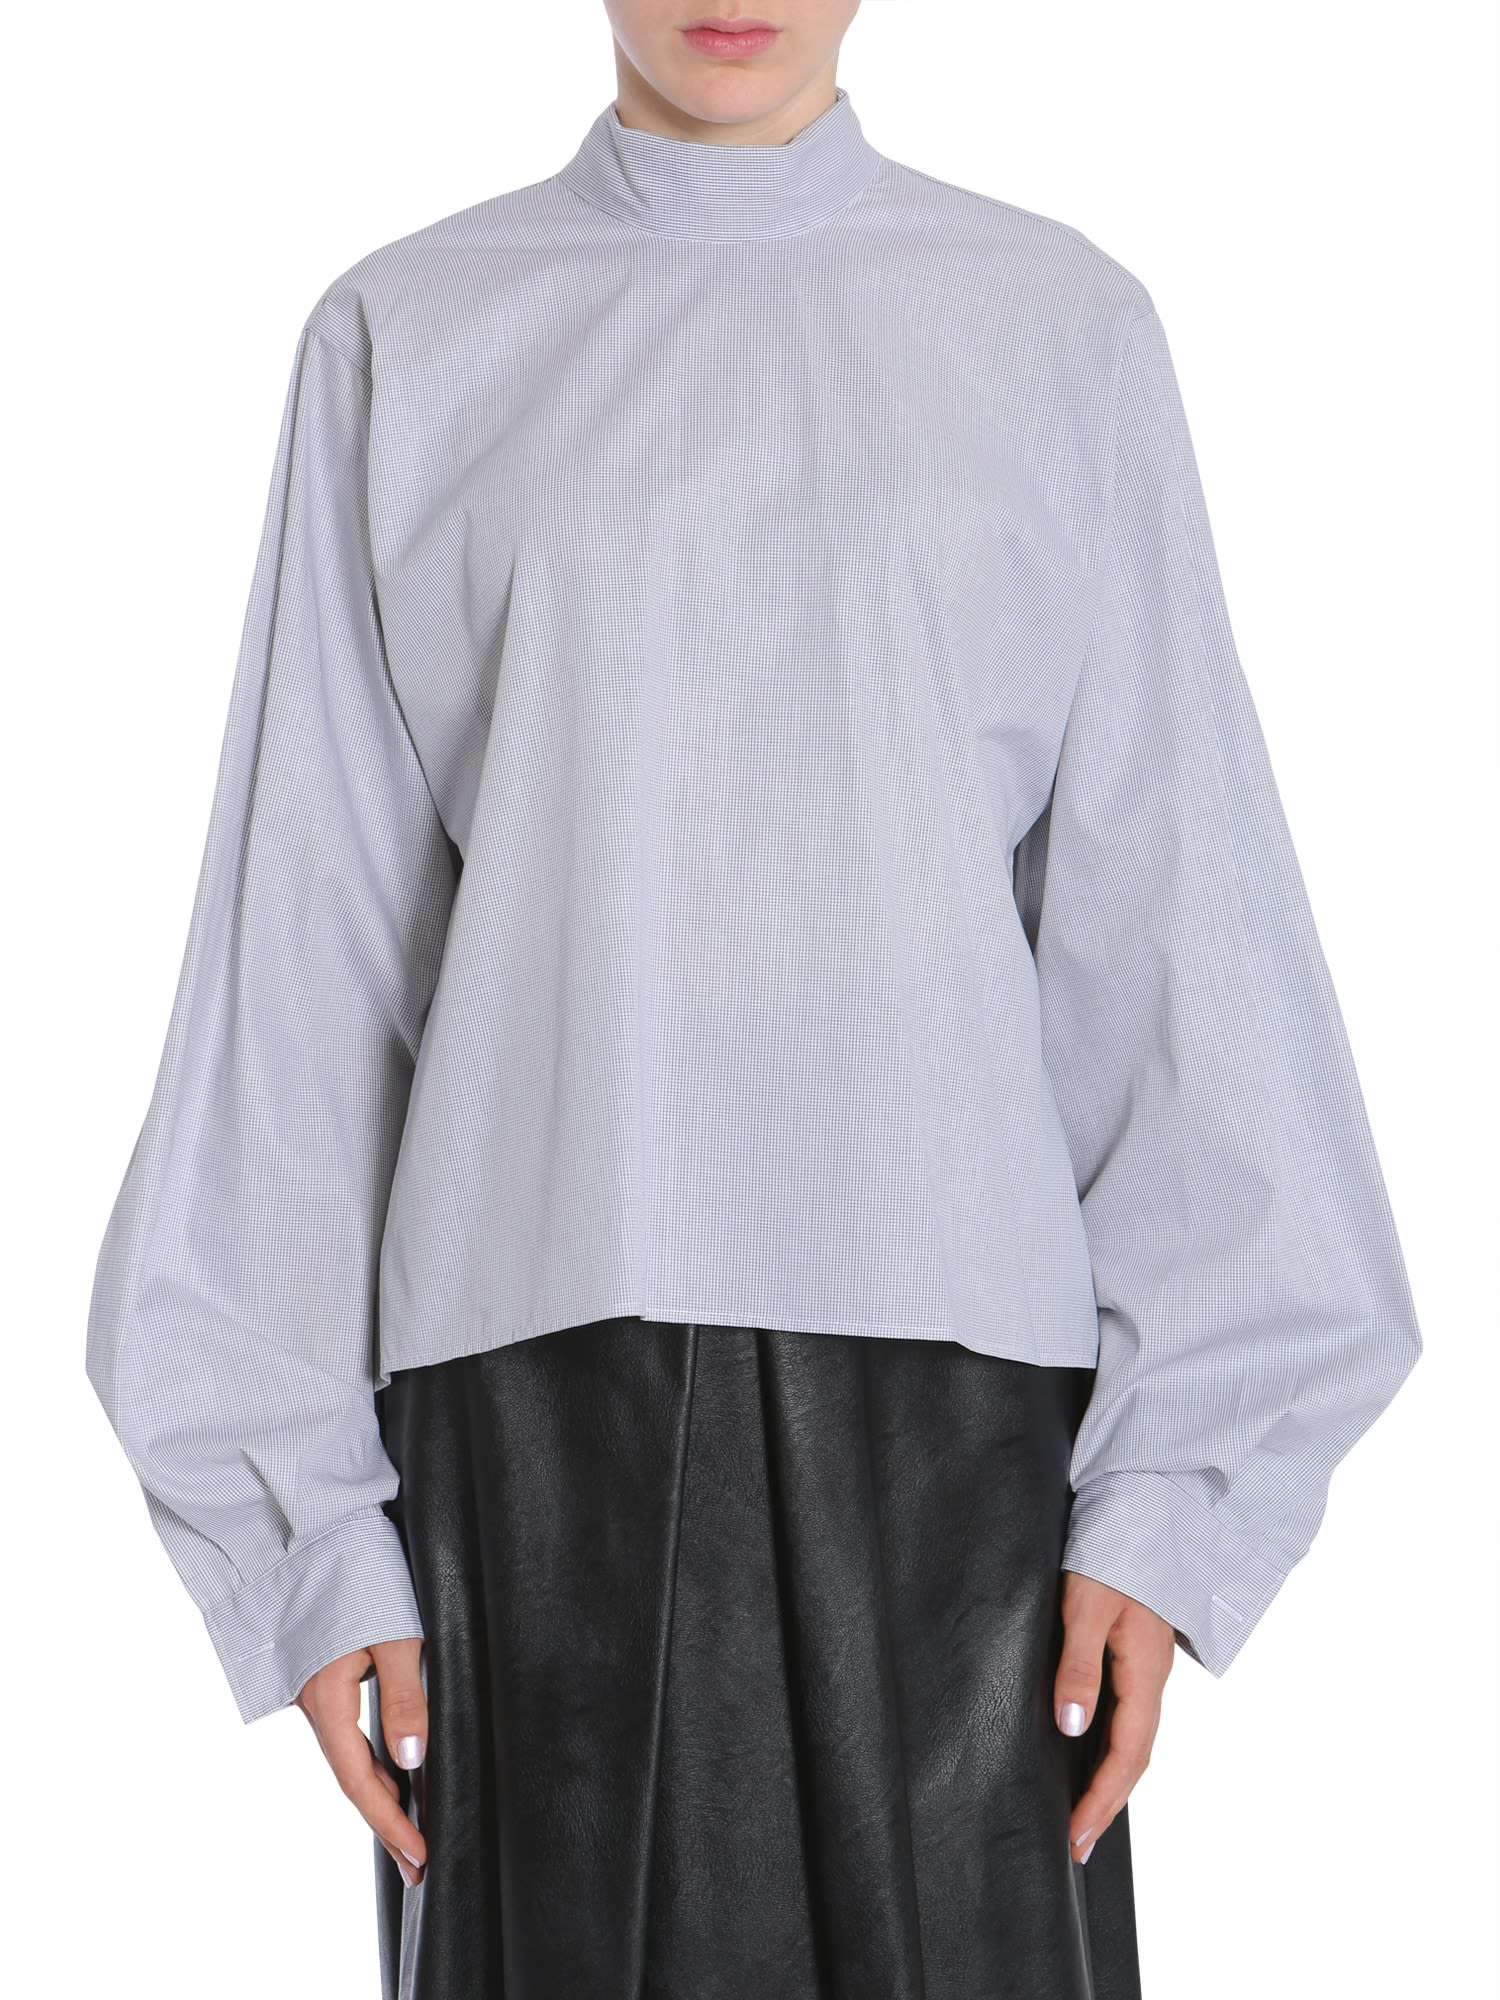 MM6 Maison Margiela Cotton Poplin Shirt